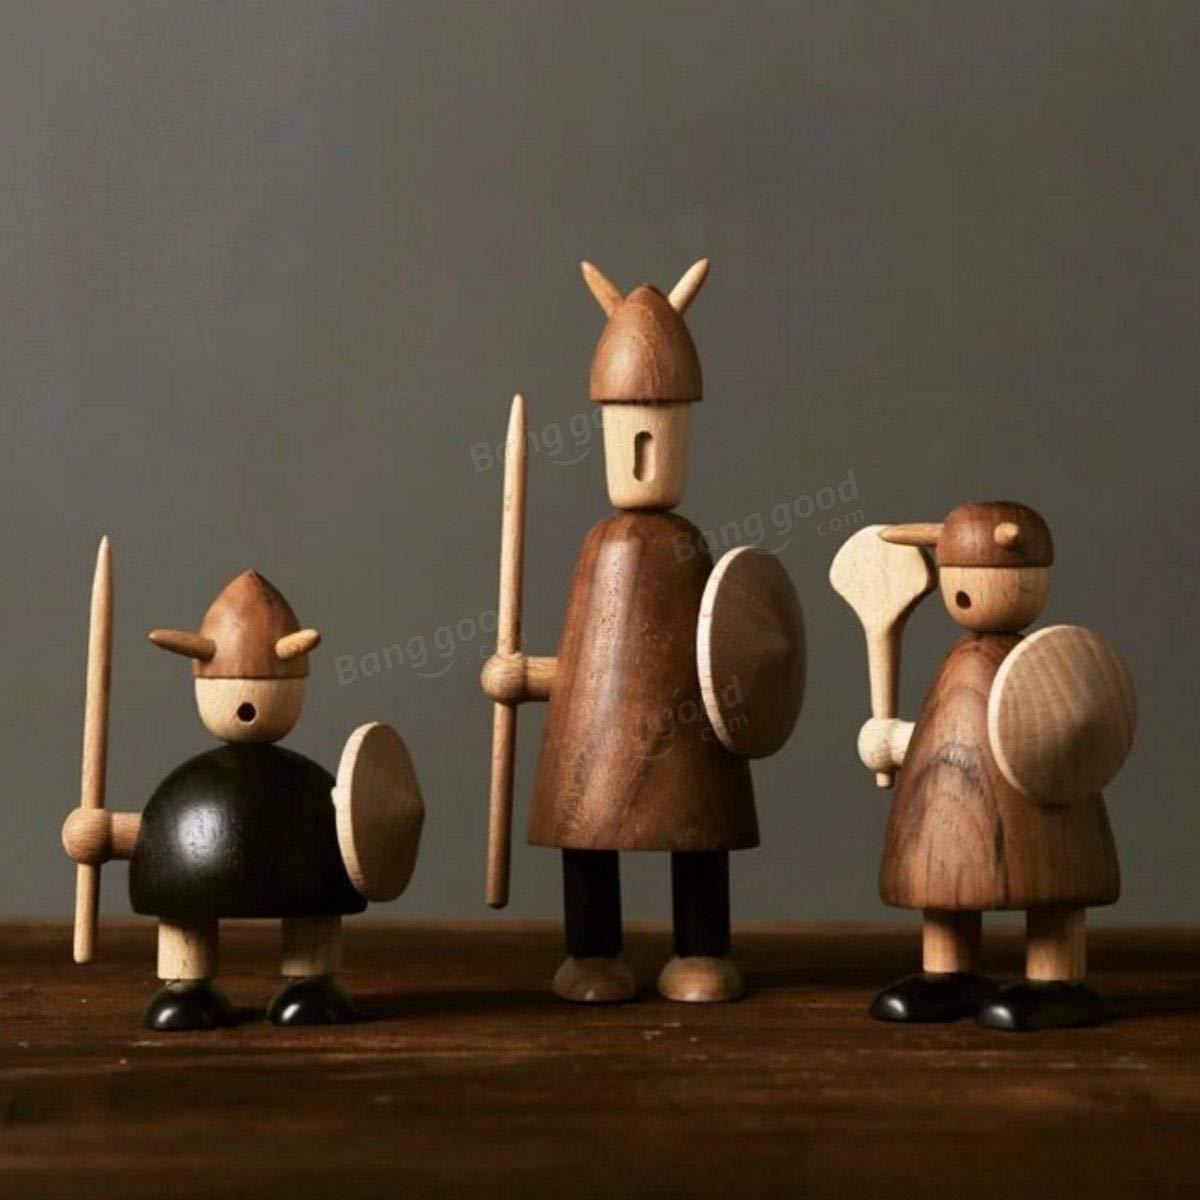 Global Global Global Brands Online Dänemark Stil Viking Action Figure Spatz Tiere Holz Puppe Teak Puppet Home Desktop Decor Spielzeug Geschenk ca91c7